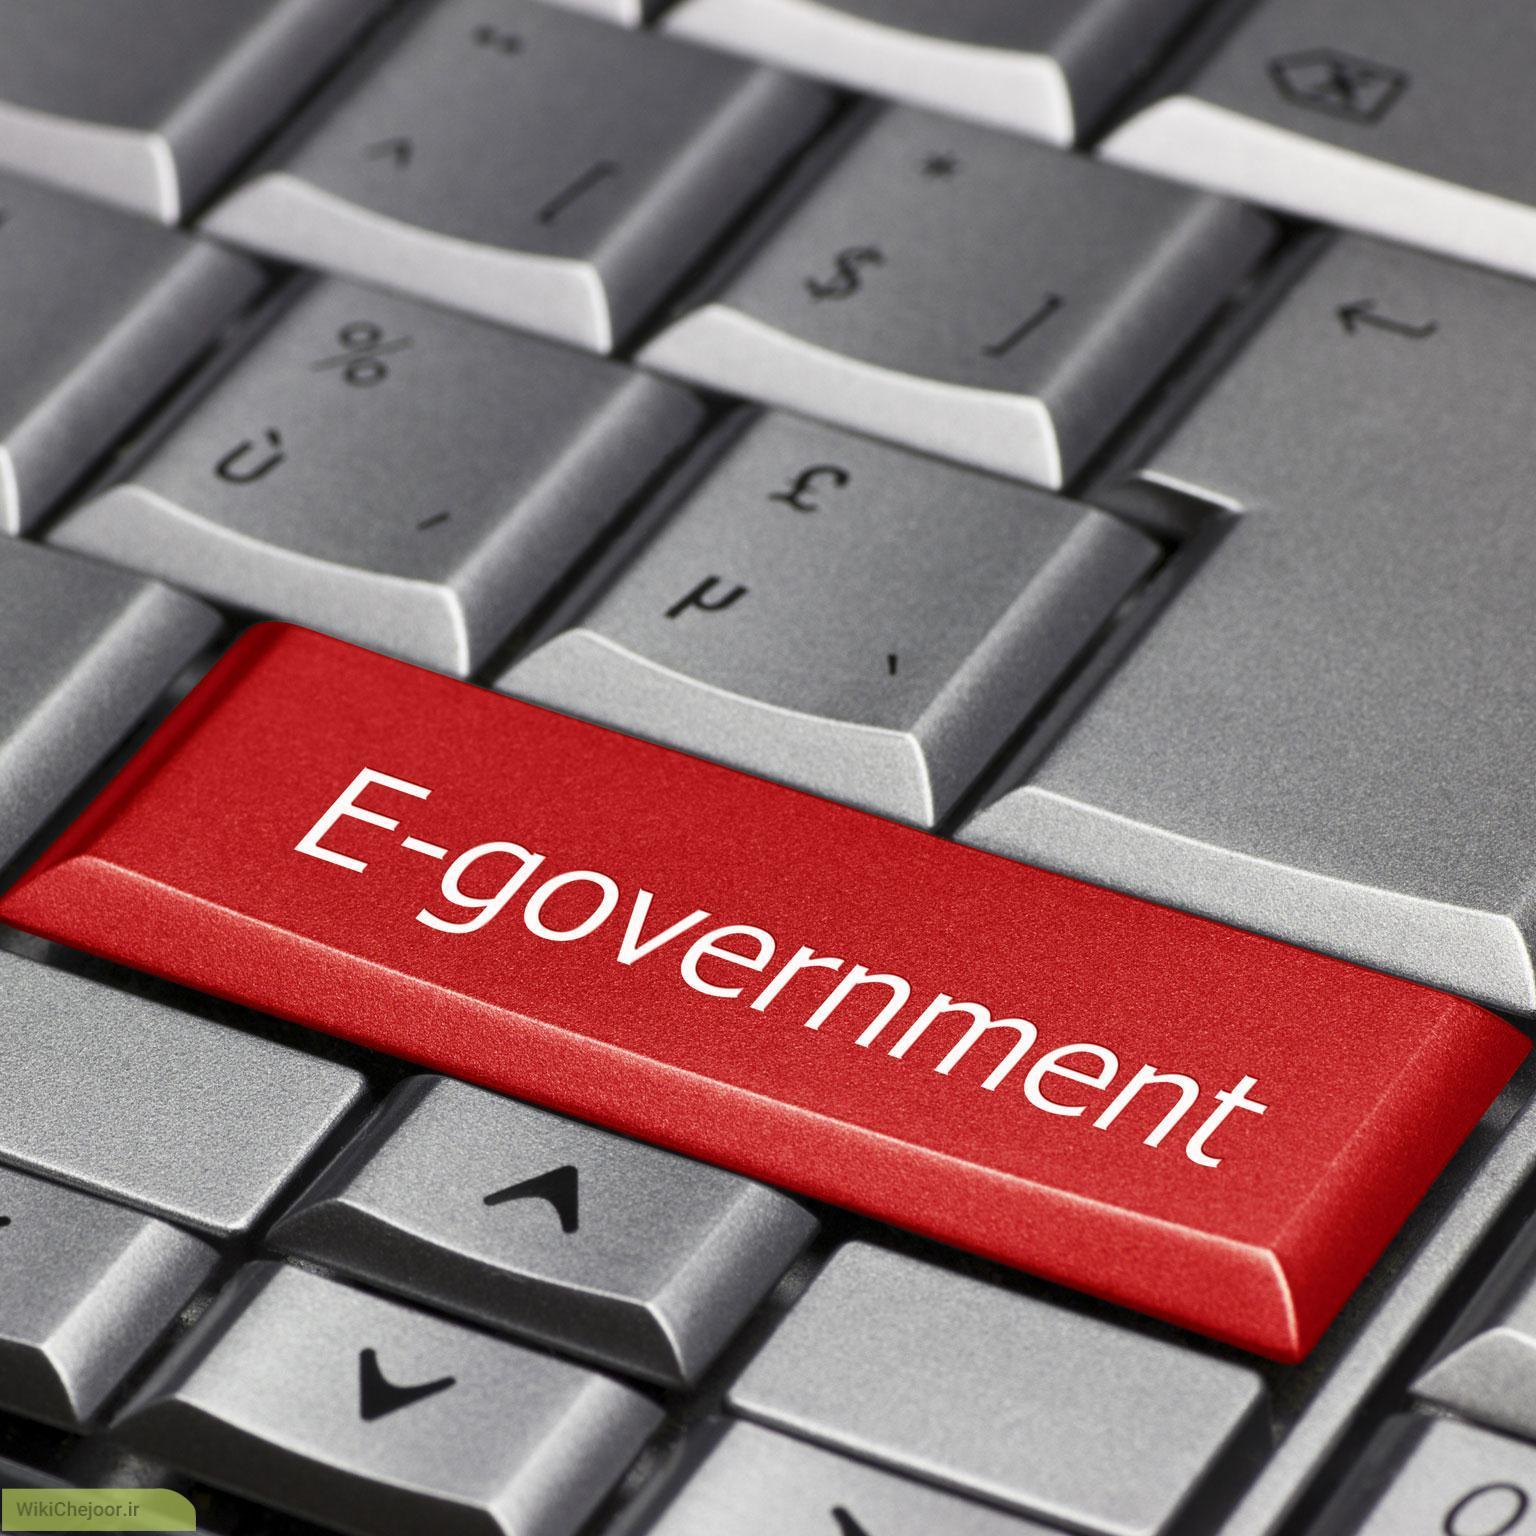 چگونه دولت الکترونیک خلق می شود؟